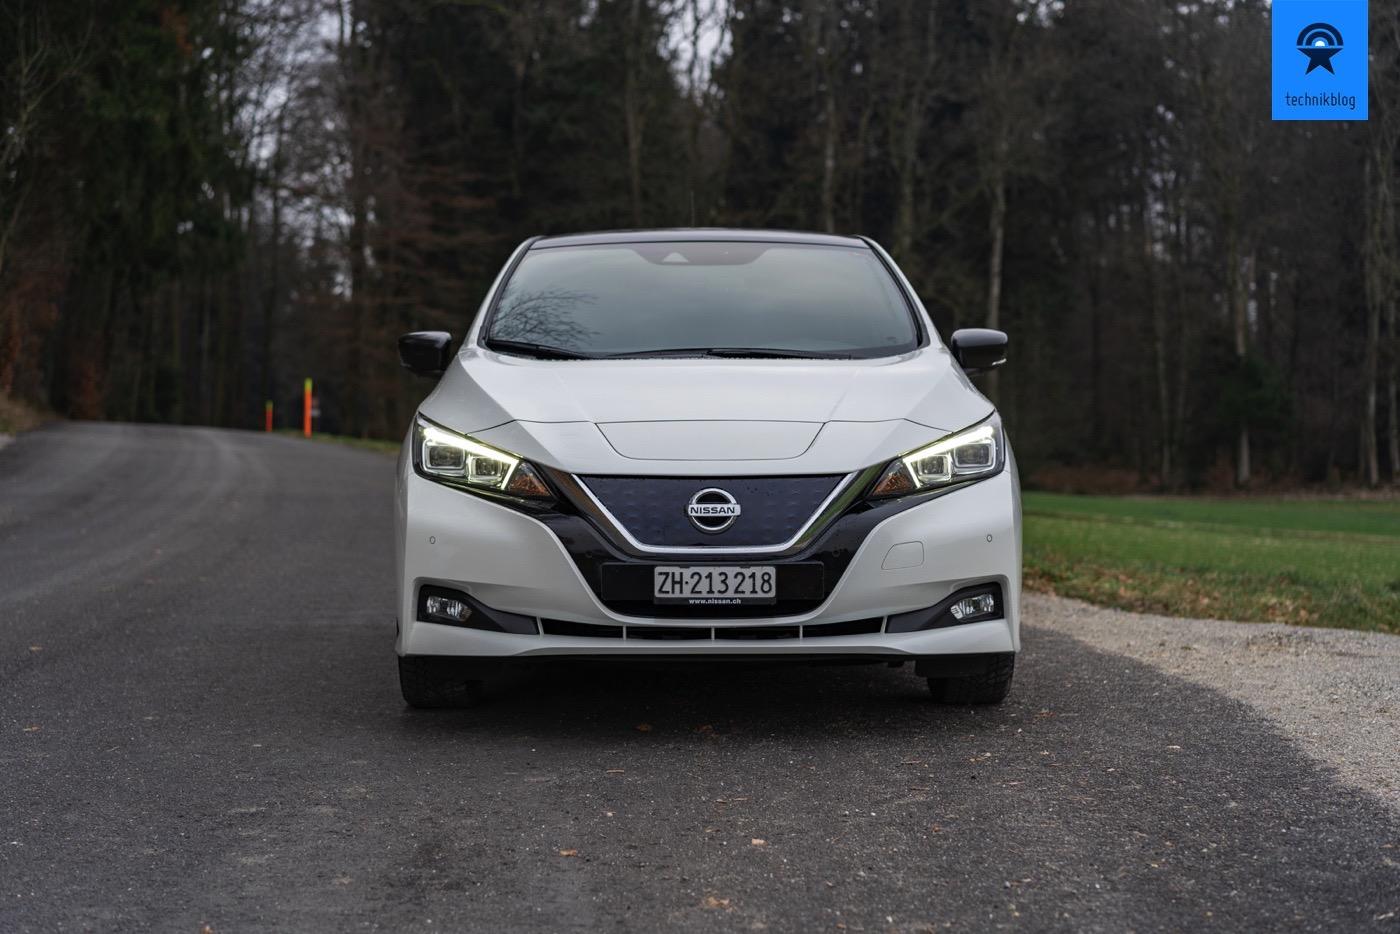 Nissan Leaf Frontansicht